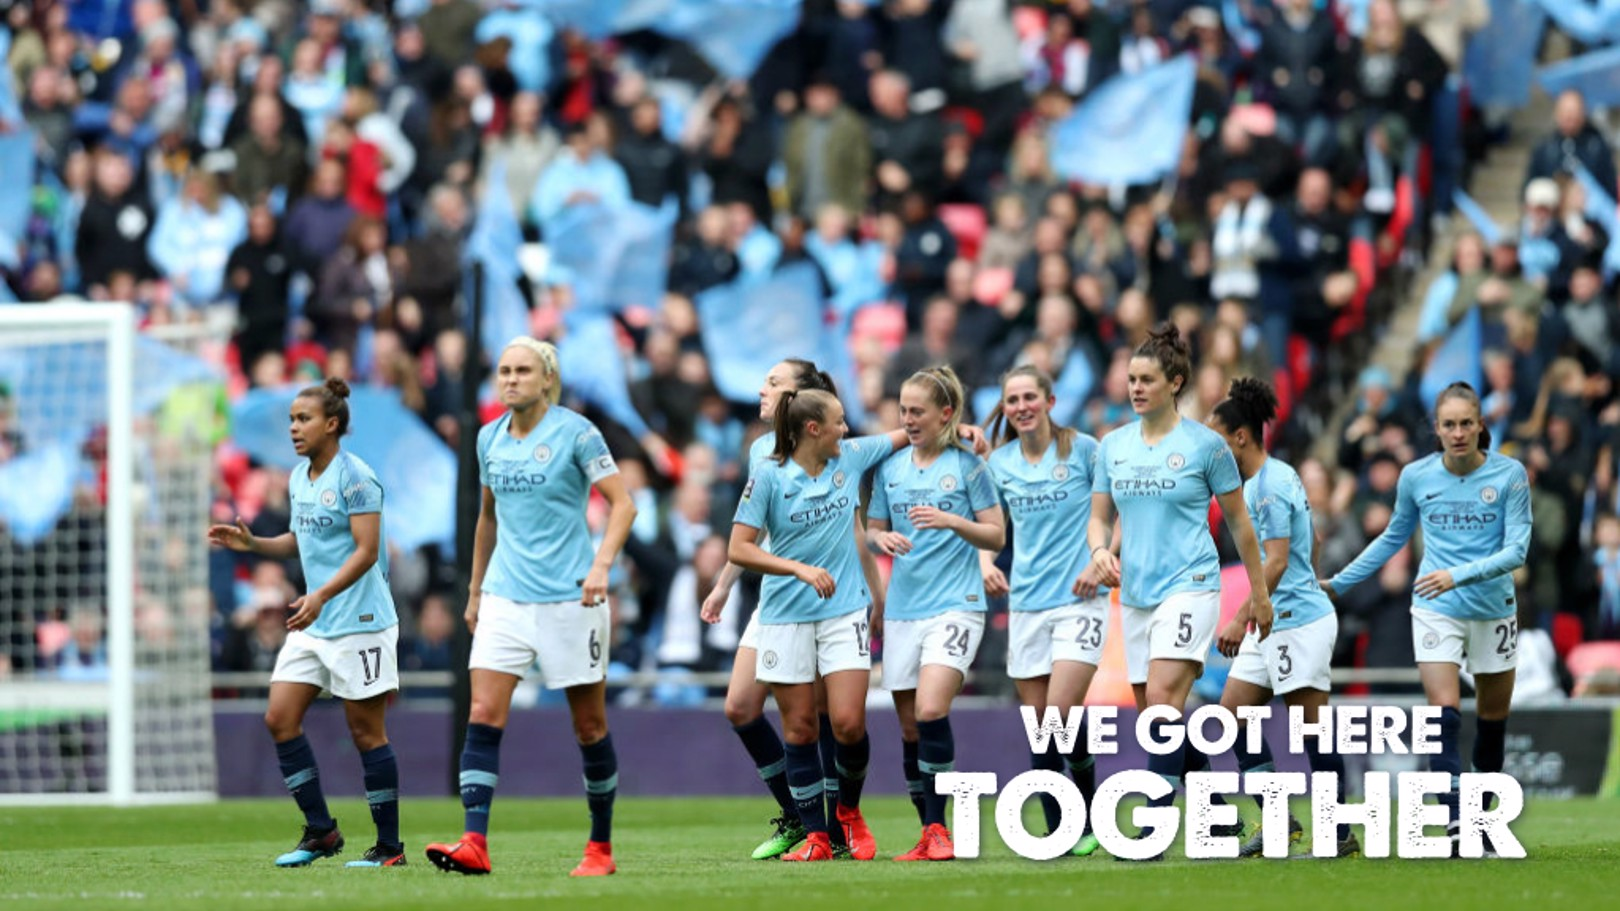 TOGETHER: City celebrate at Wembley.